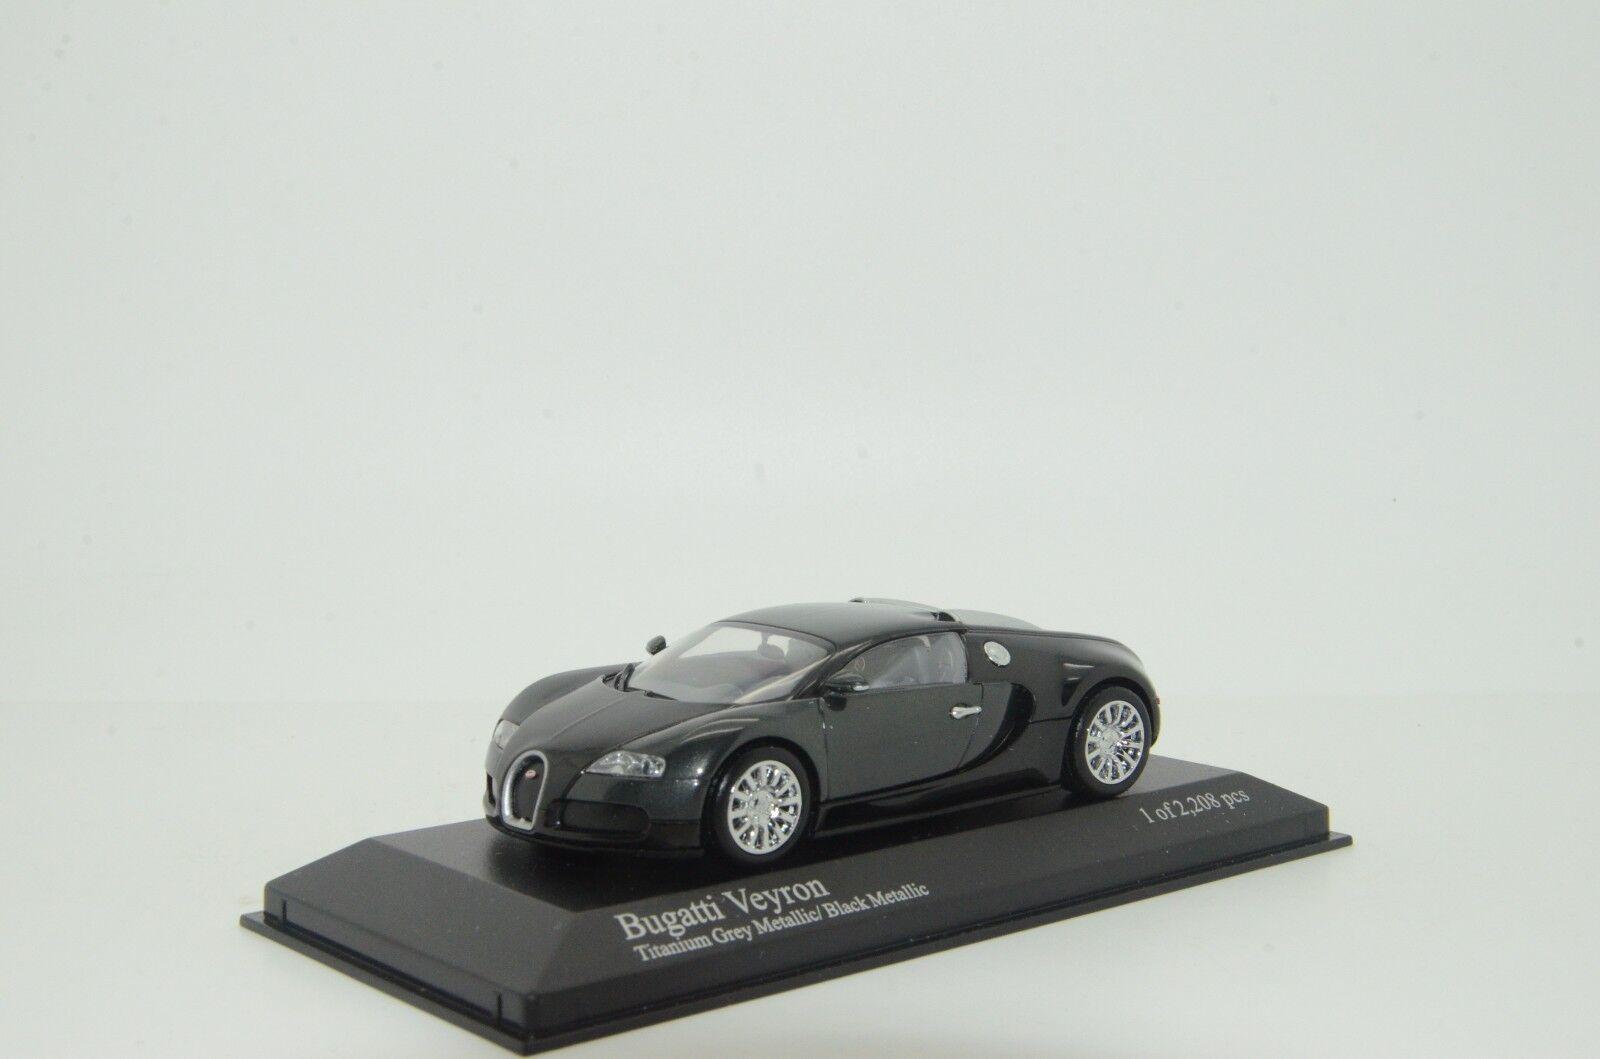 promociones emocionantes rara Bugatti Bugatti Bugatti Veyron 2018 Gris/Negro Metalizado Minichamps 1102820 1/43  nuevo listado